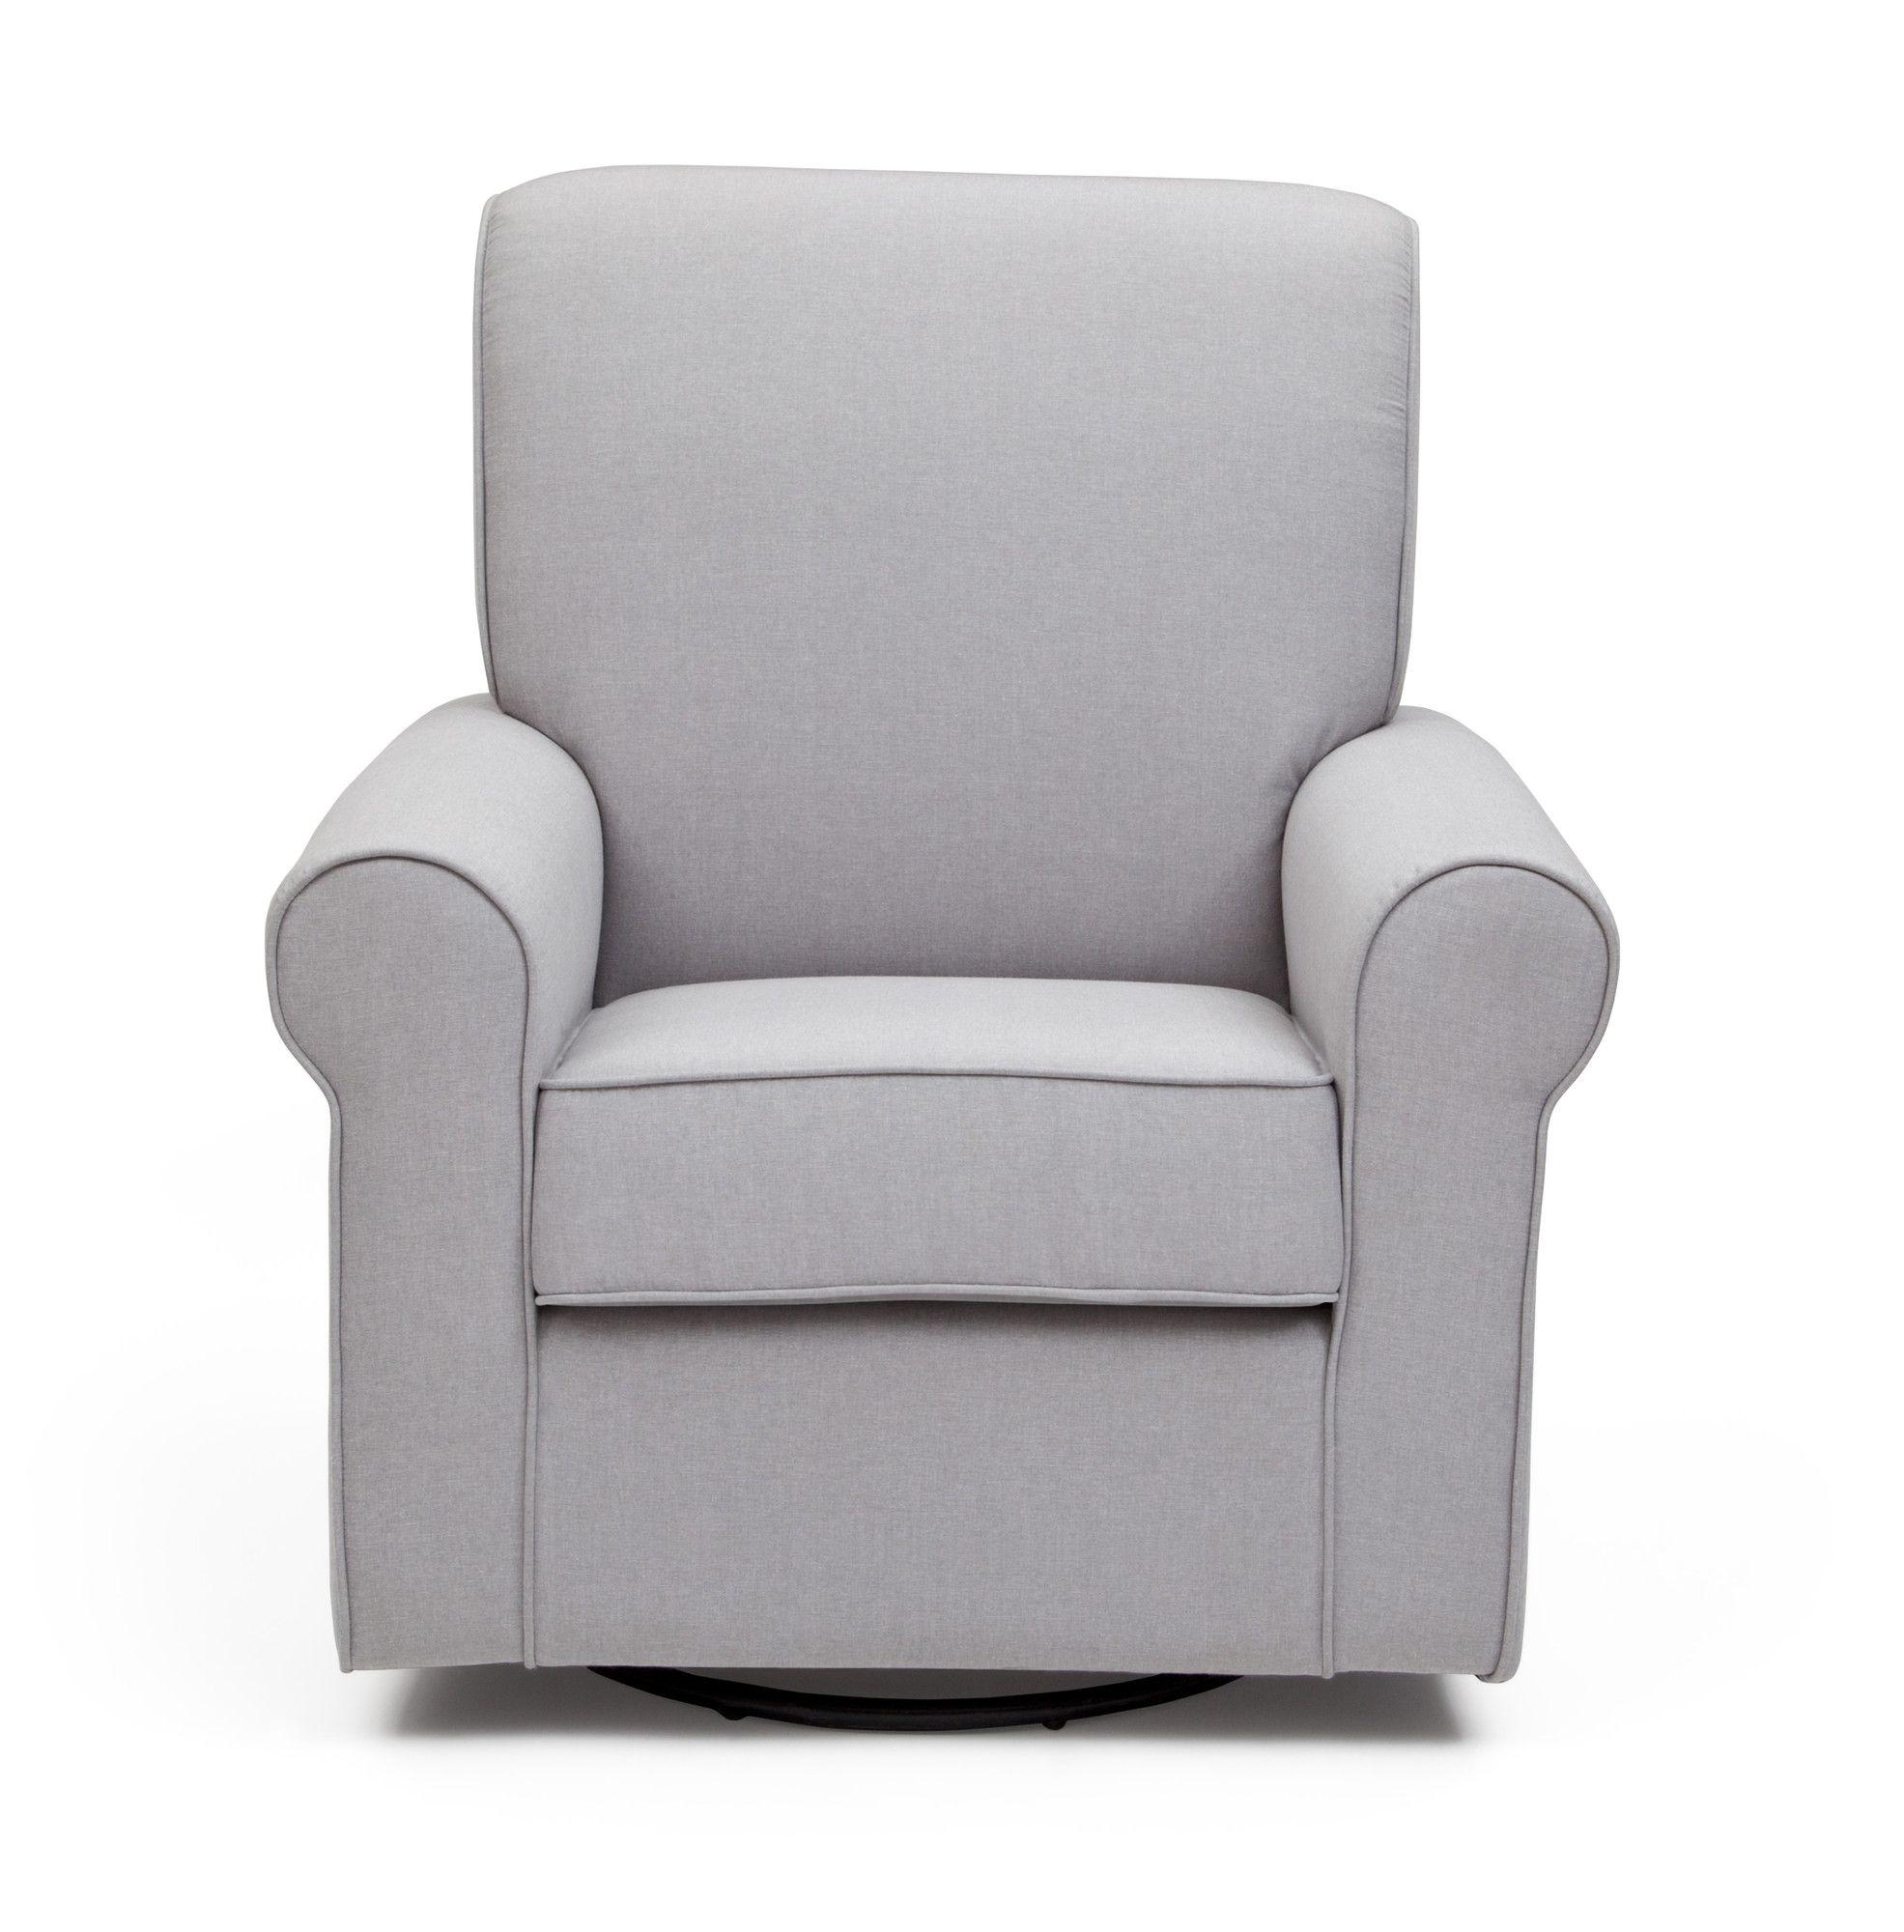 Upholstered rocking chairs avery glider  wayfair  baby dot  pinterest  gliders